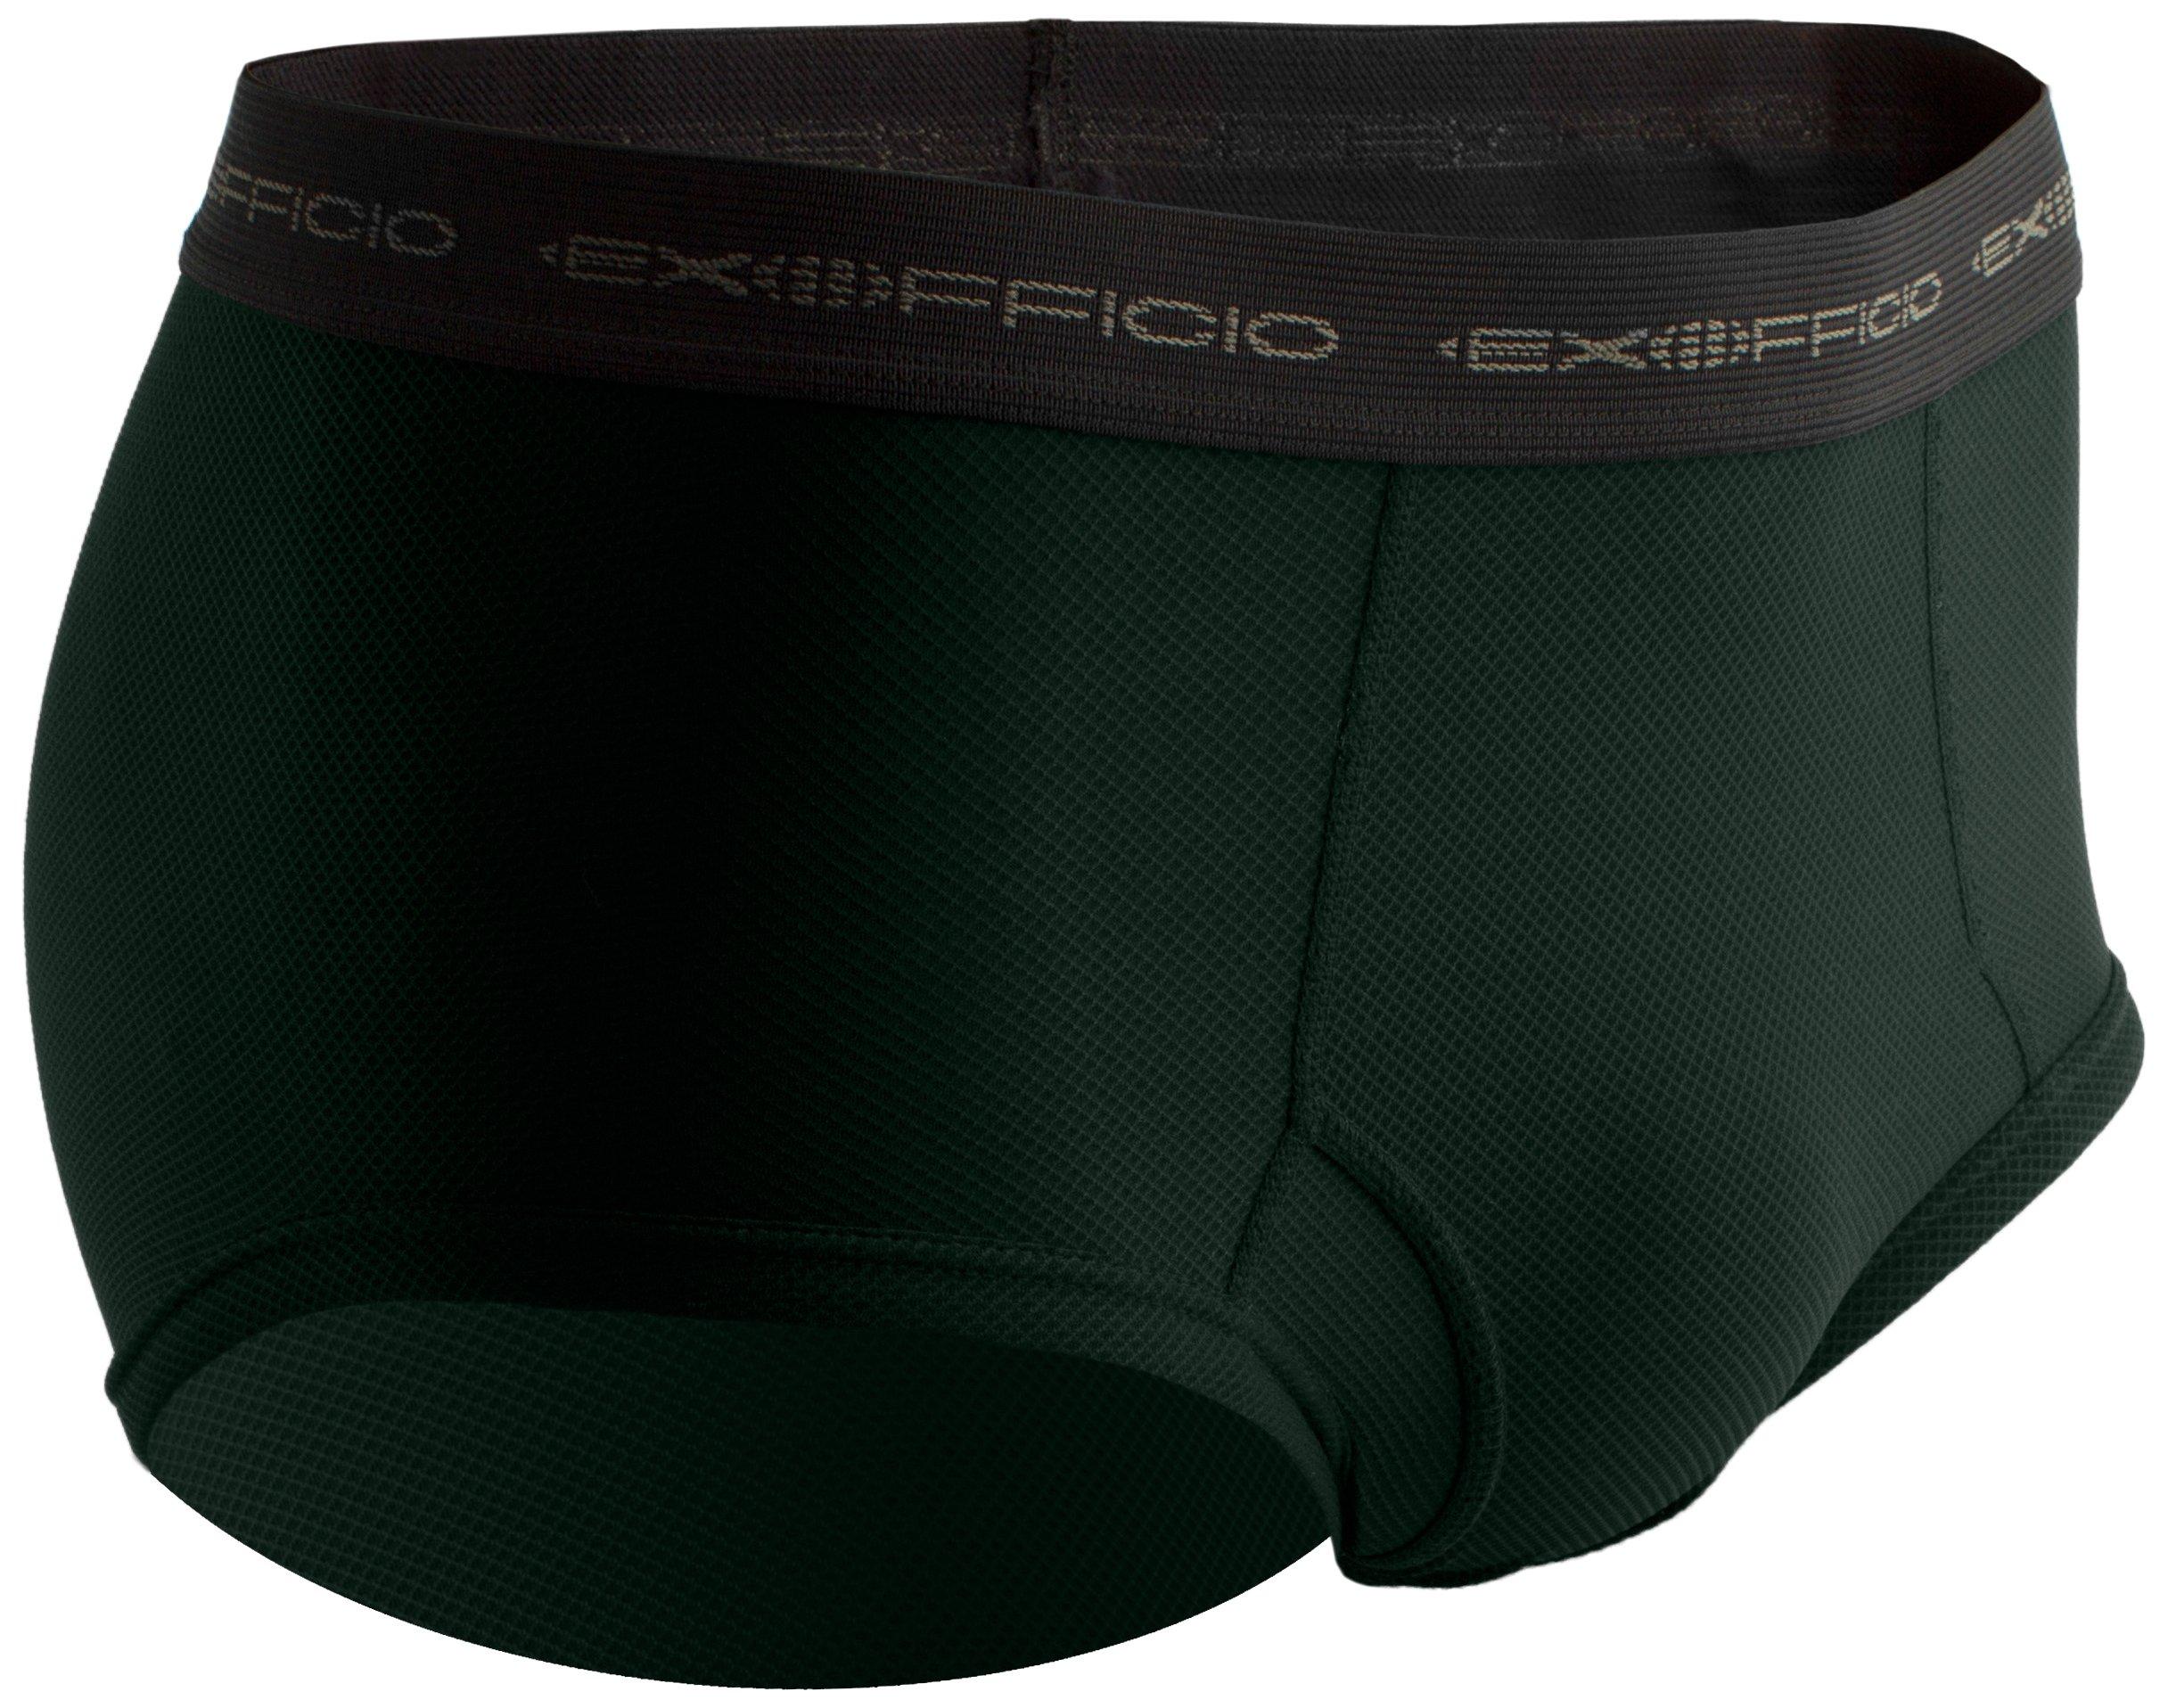 ExOfficio Men's Give-N-Go Brief Travel Underwear,Ponderosa,X-Large